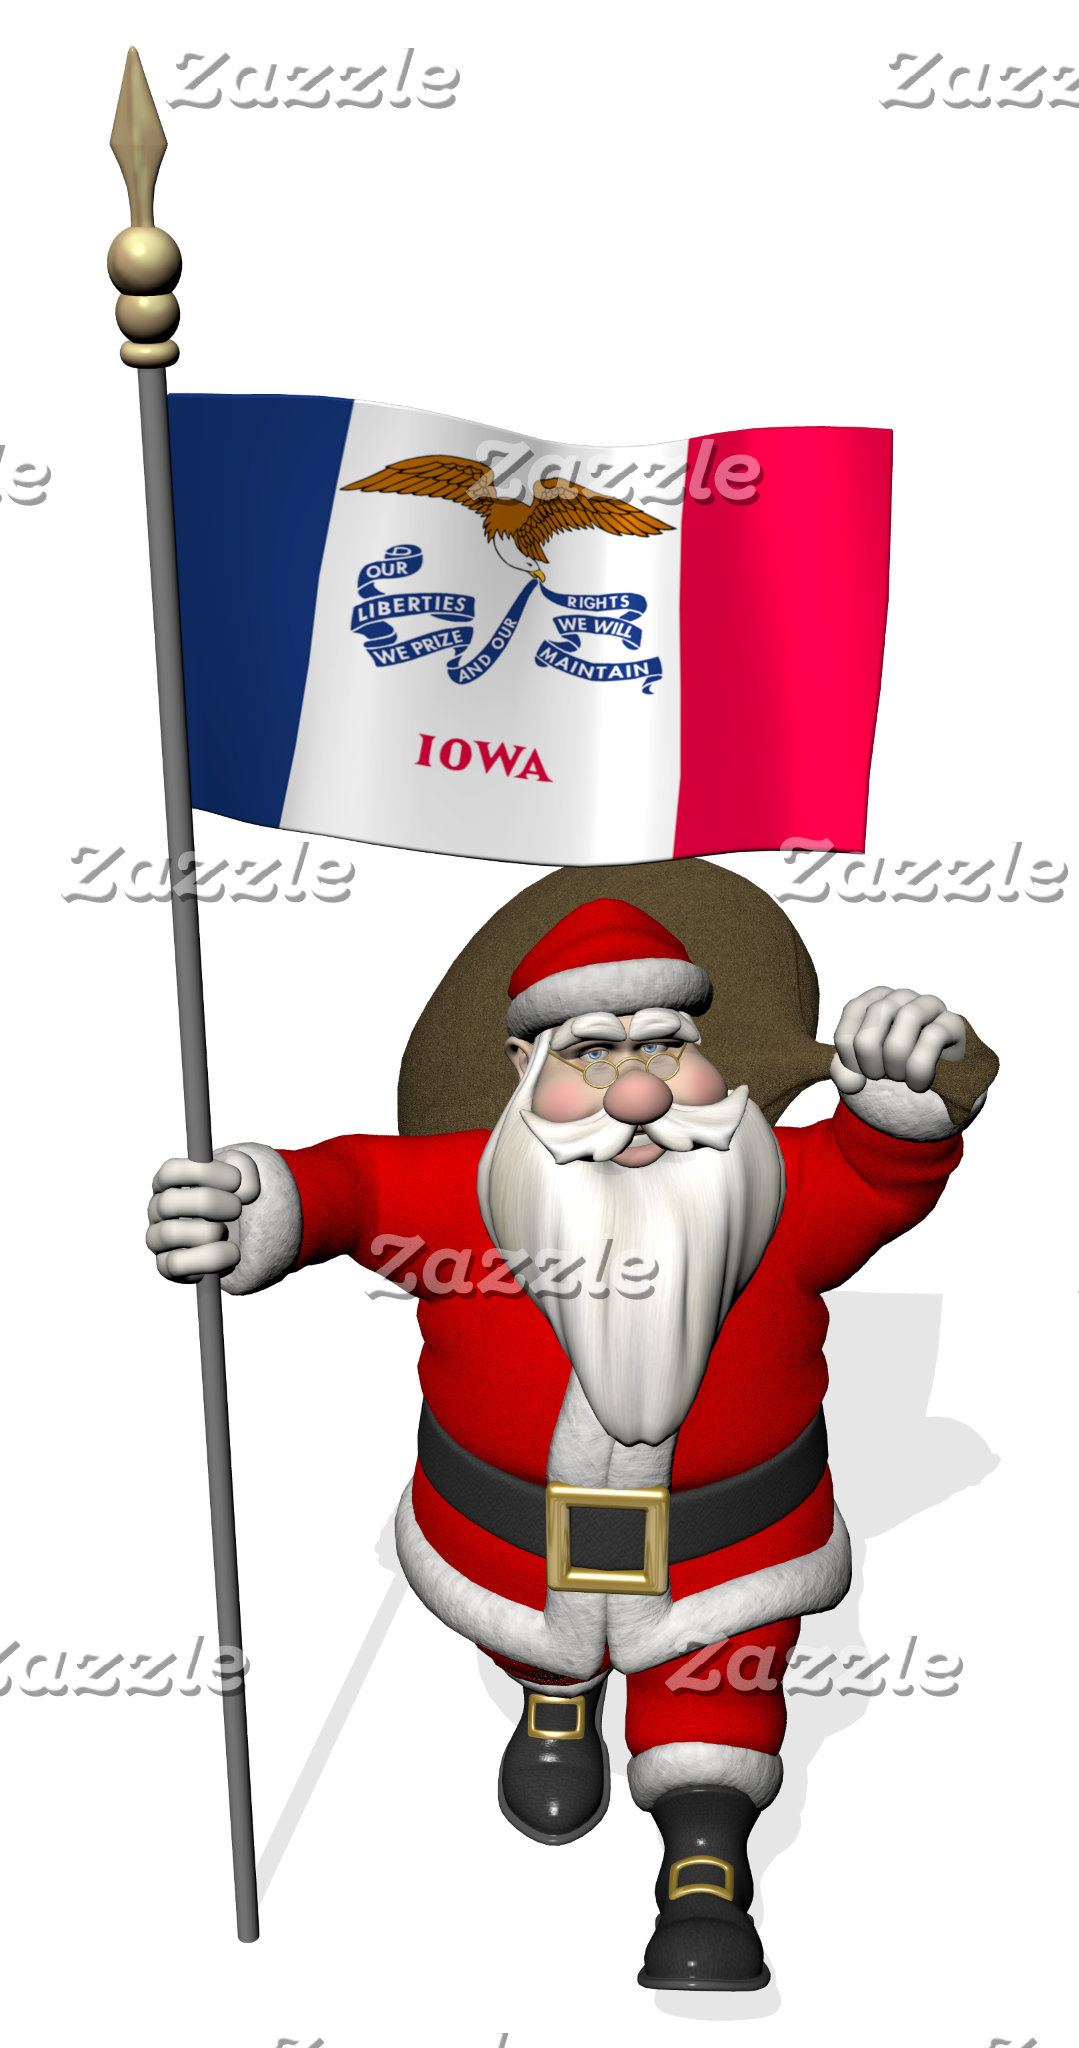 Iowa - The  Hawkeye State